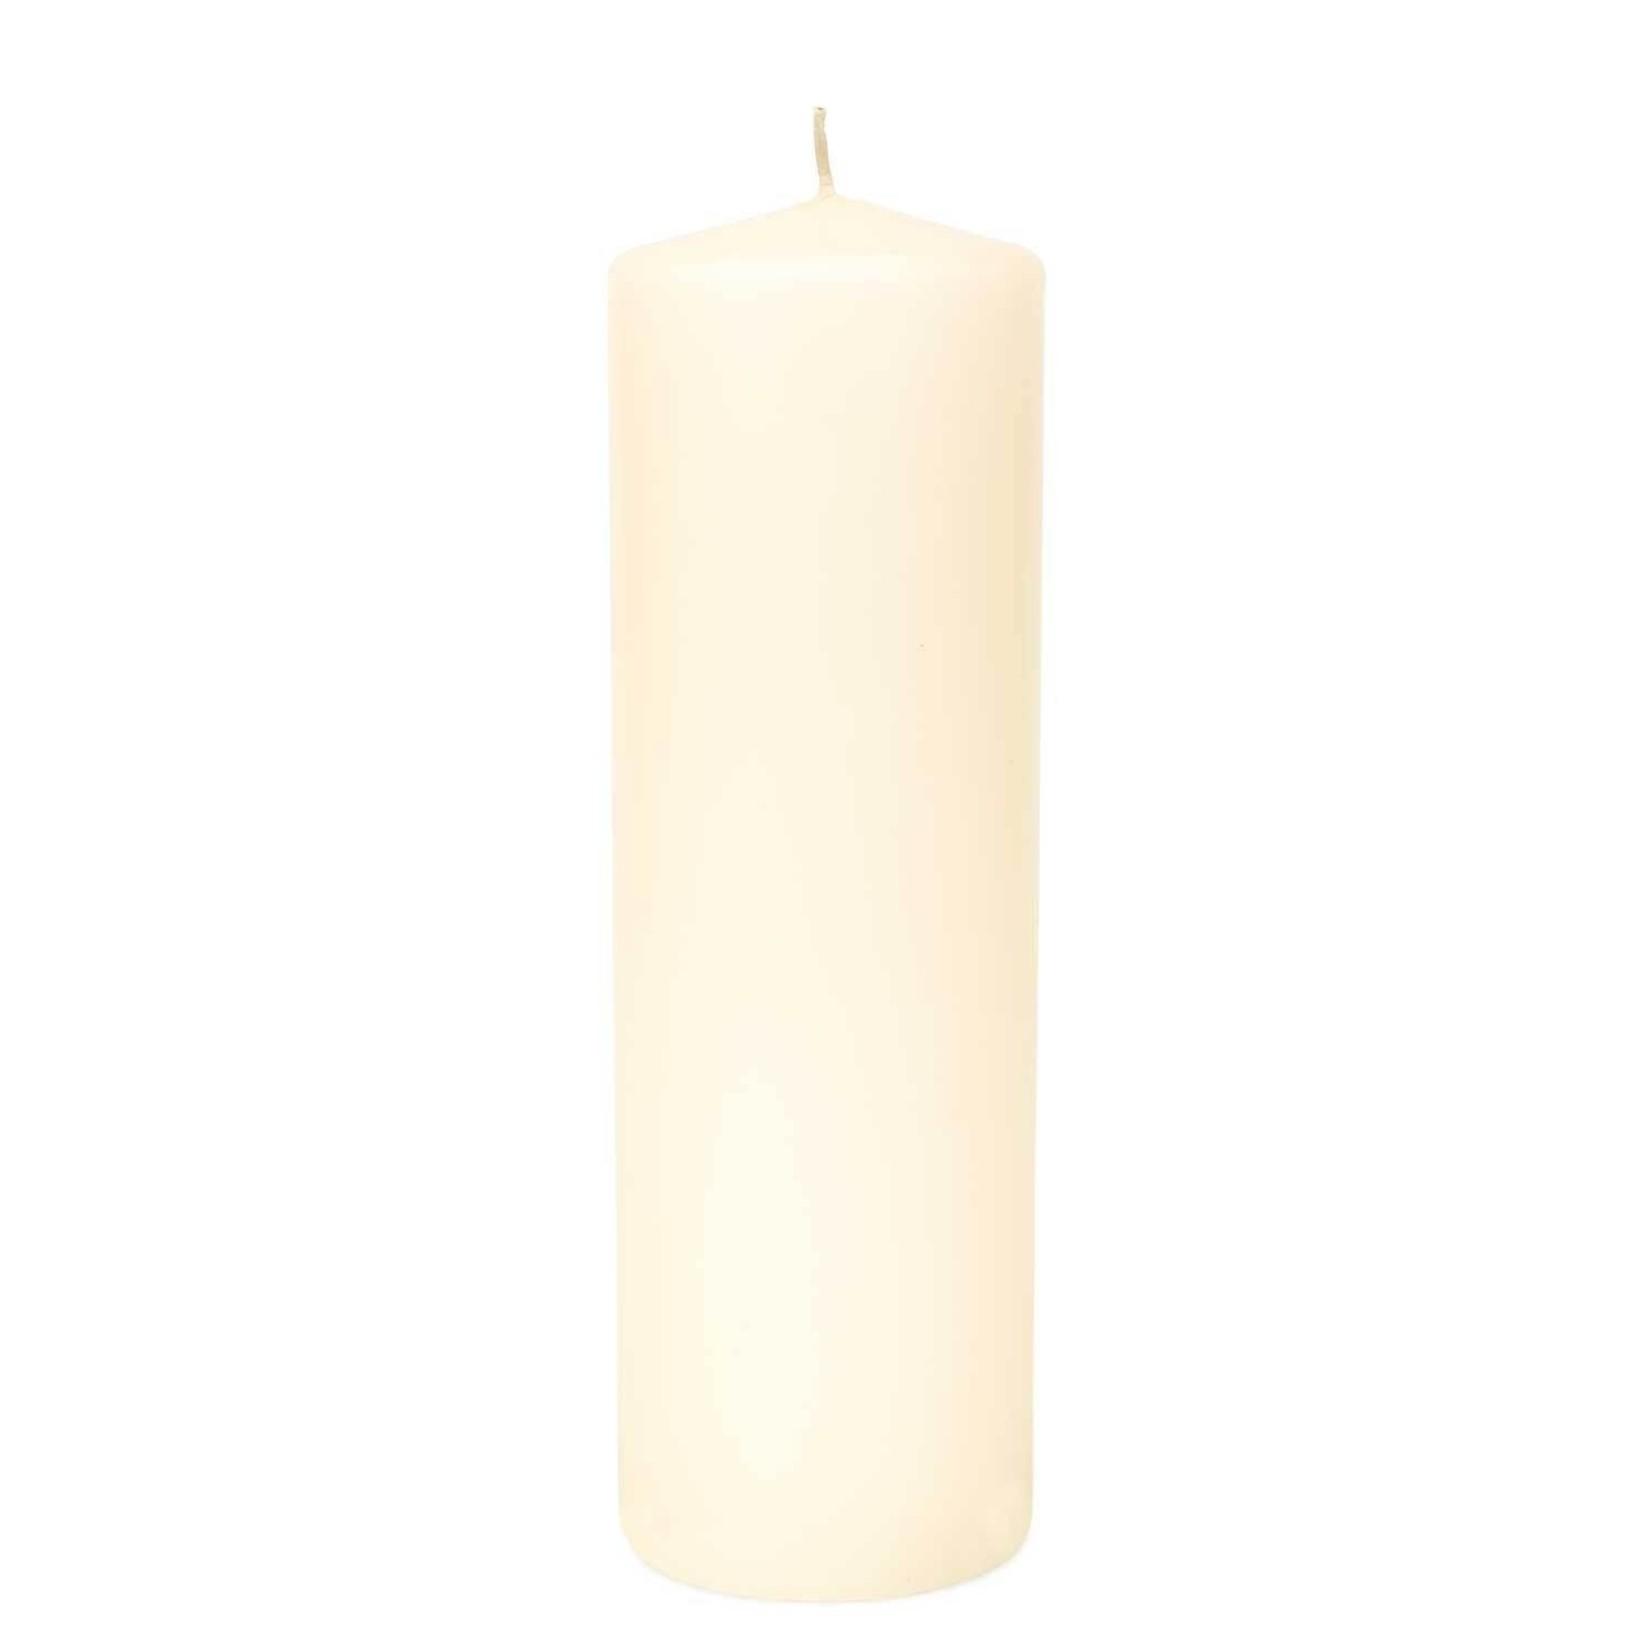 "3""""X16""""H, IVORY Round Pillar Candle"